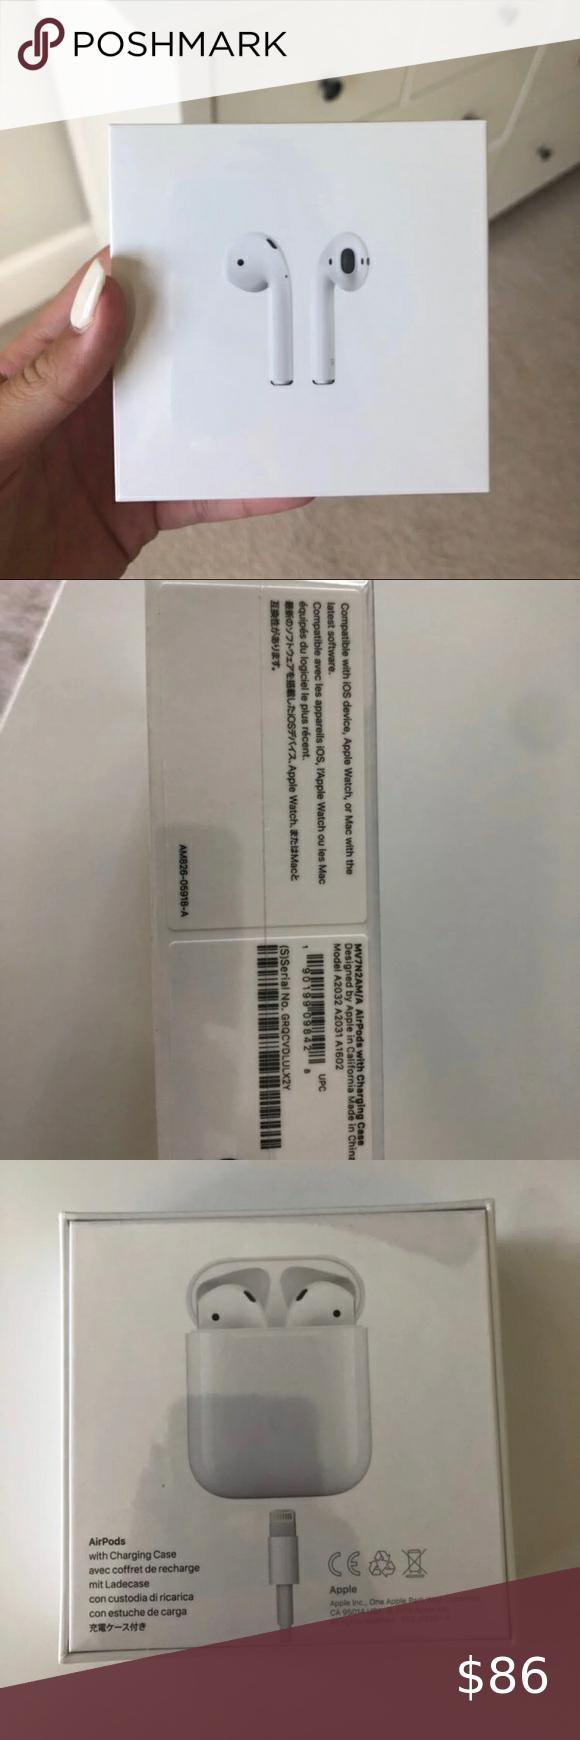 Apple Airpods 2 Apple Airpods 2nd Gen Airpods 2nd Gen Charging Case Authen Apple Airpods 2 Apple Products Apple